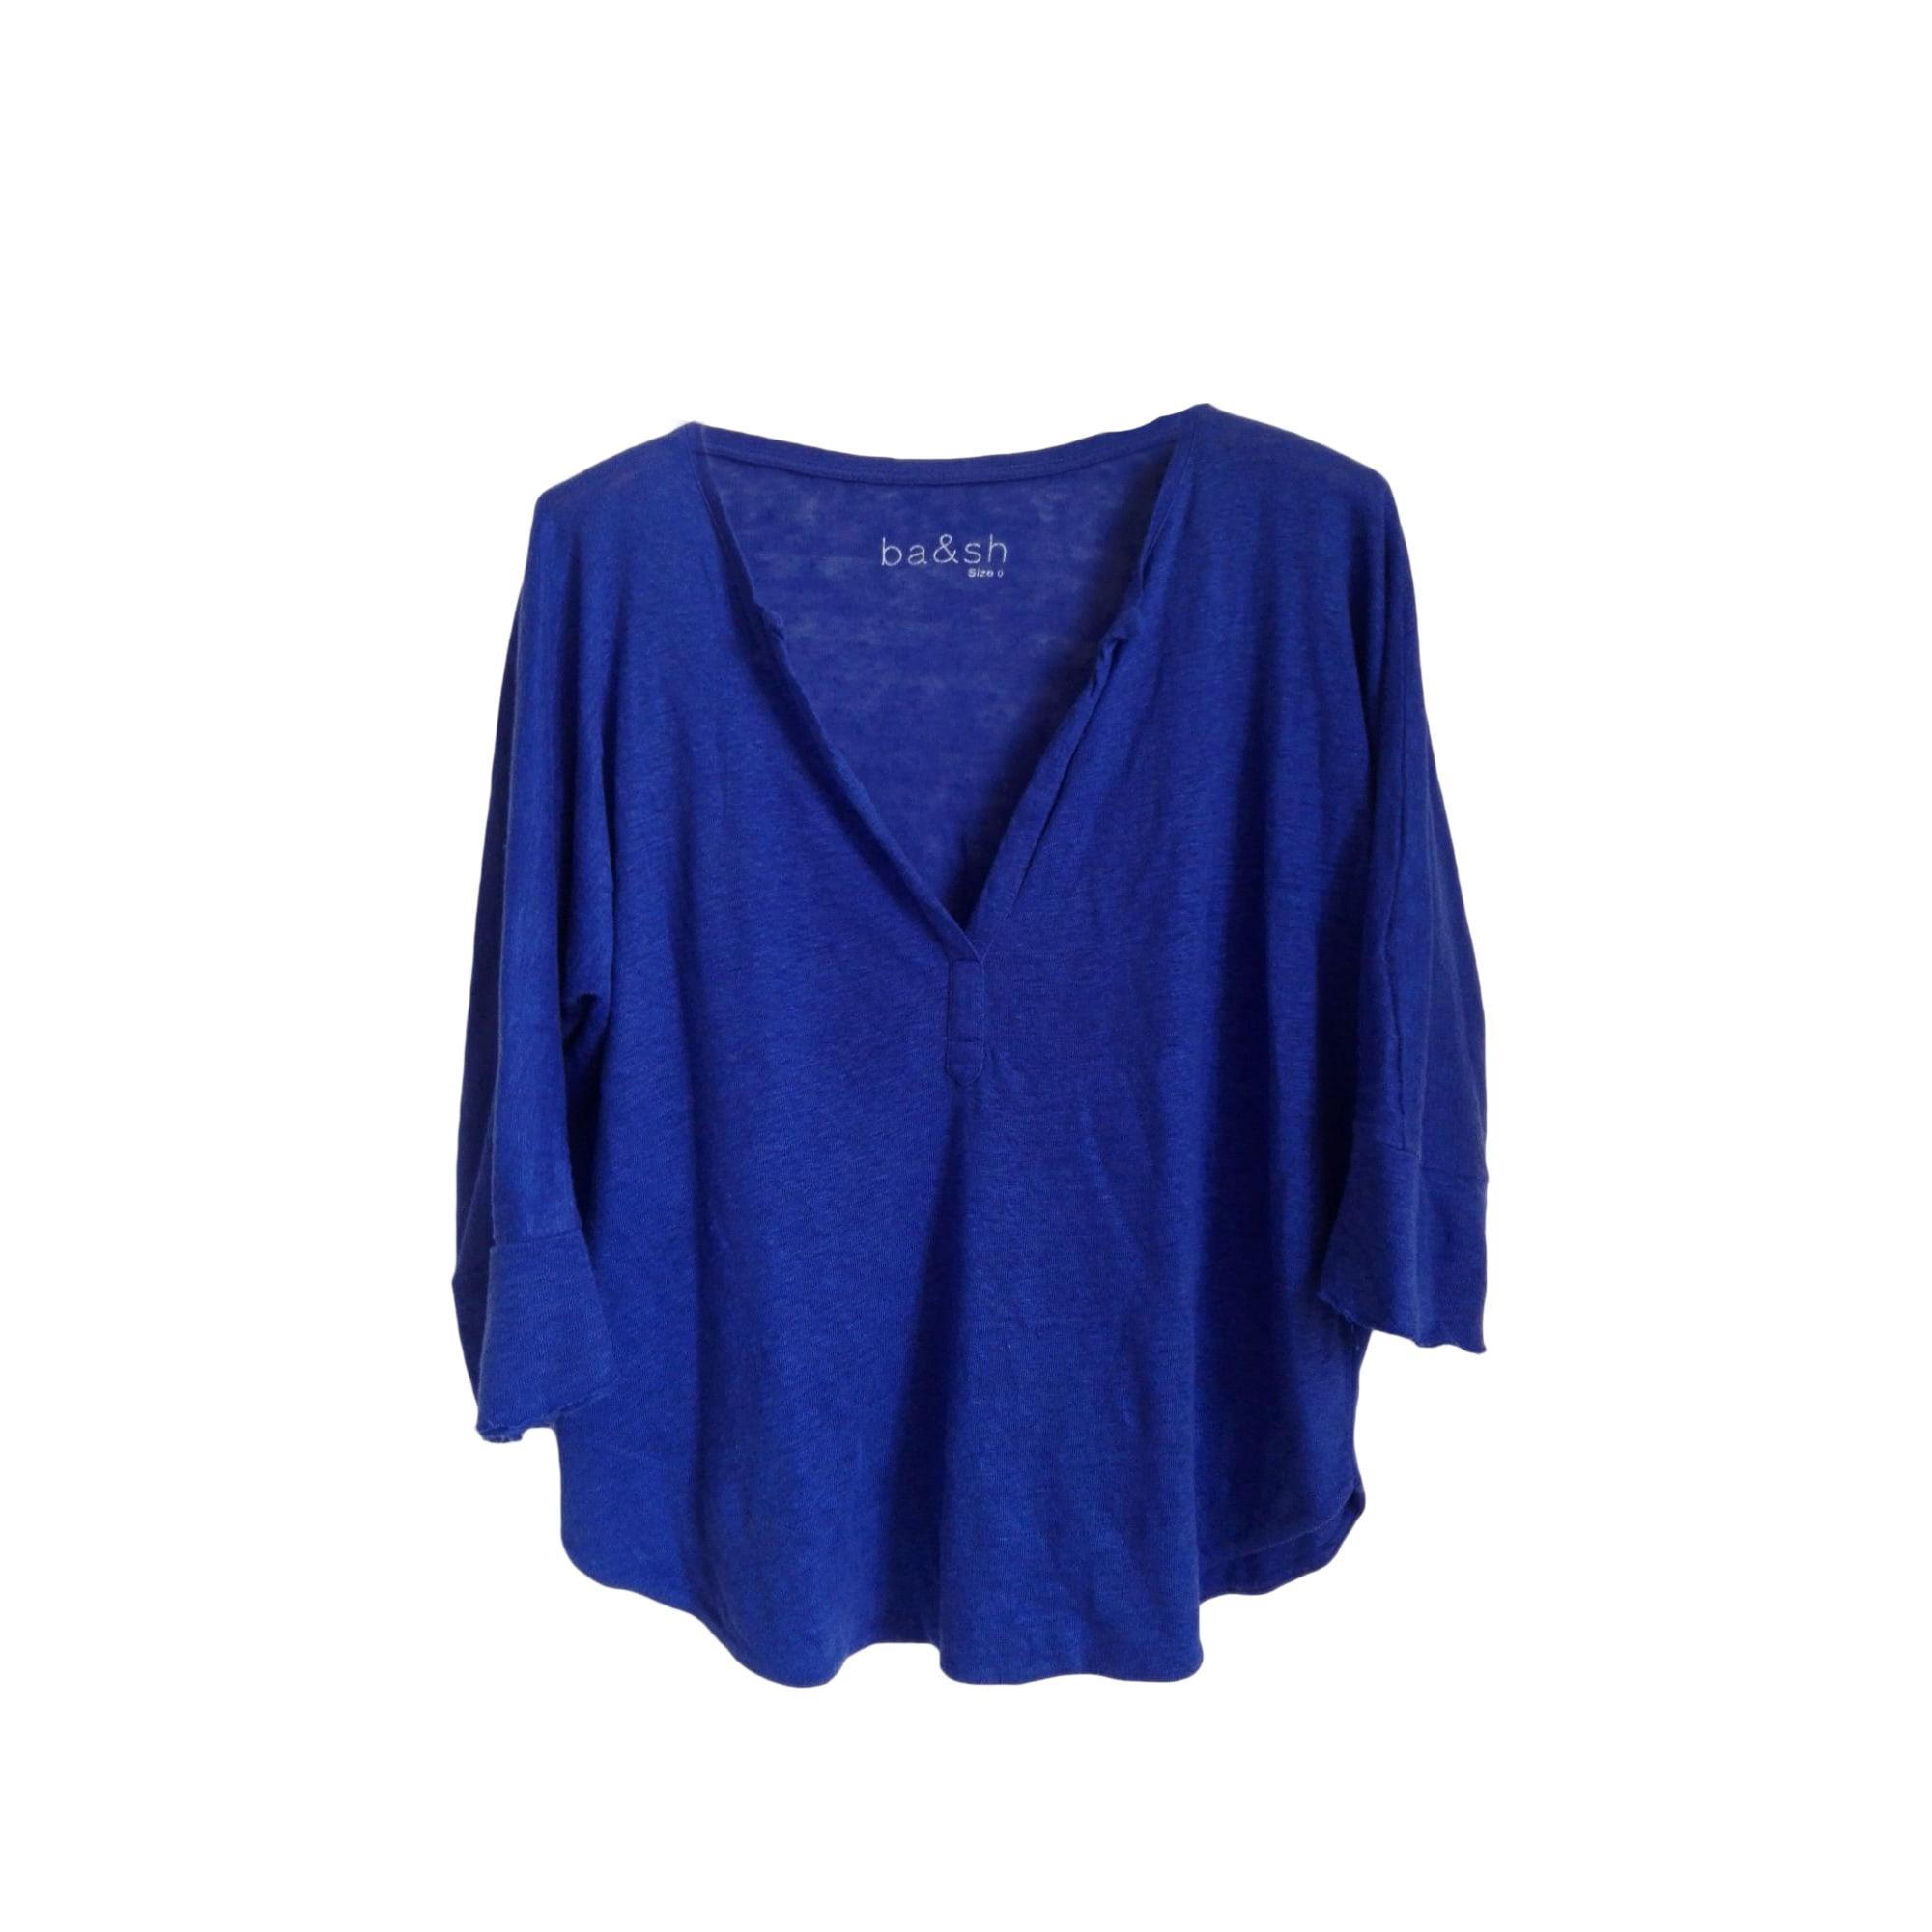 Tops, T-Shirt BA&SH Blau, marineblau, türkisblau